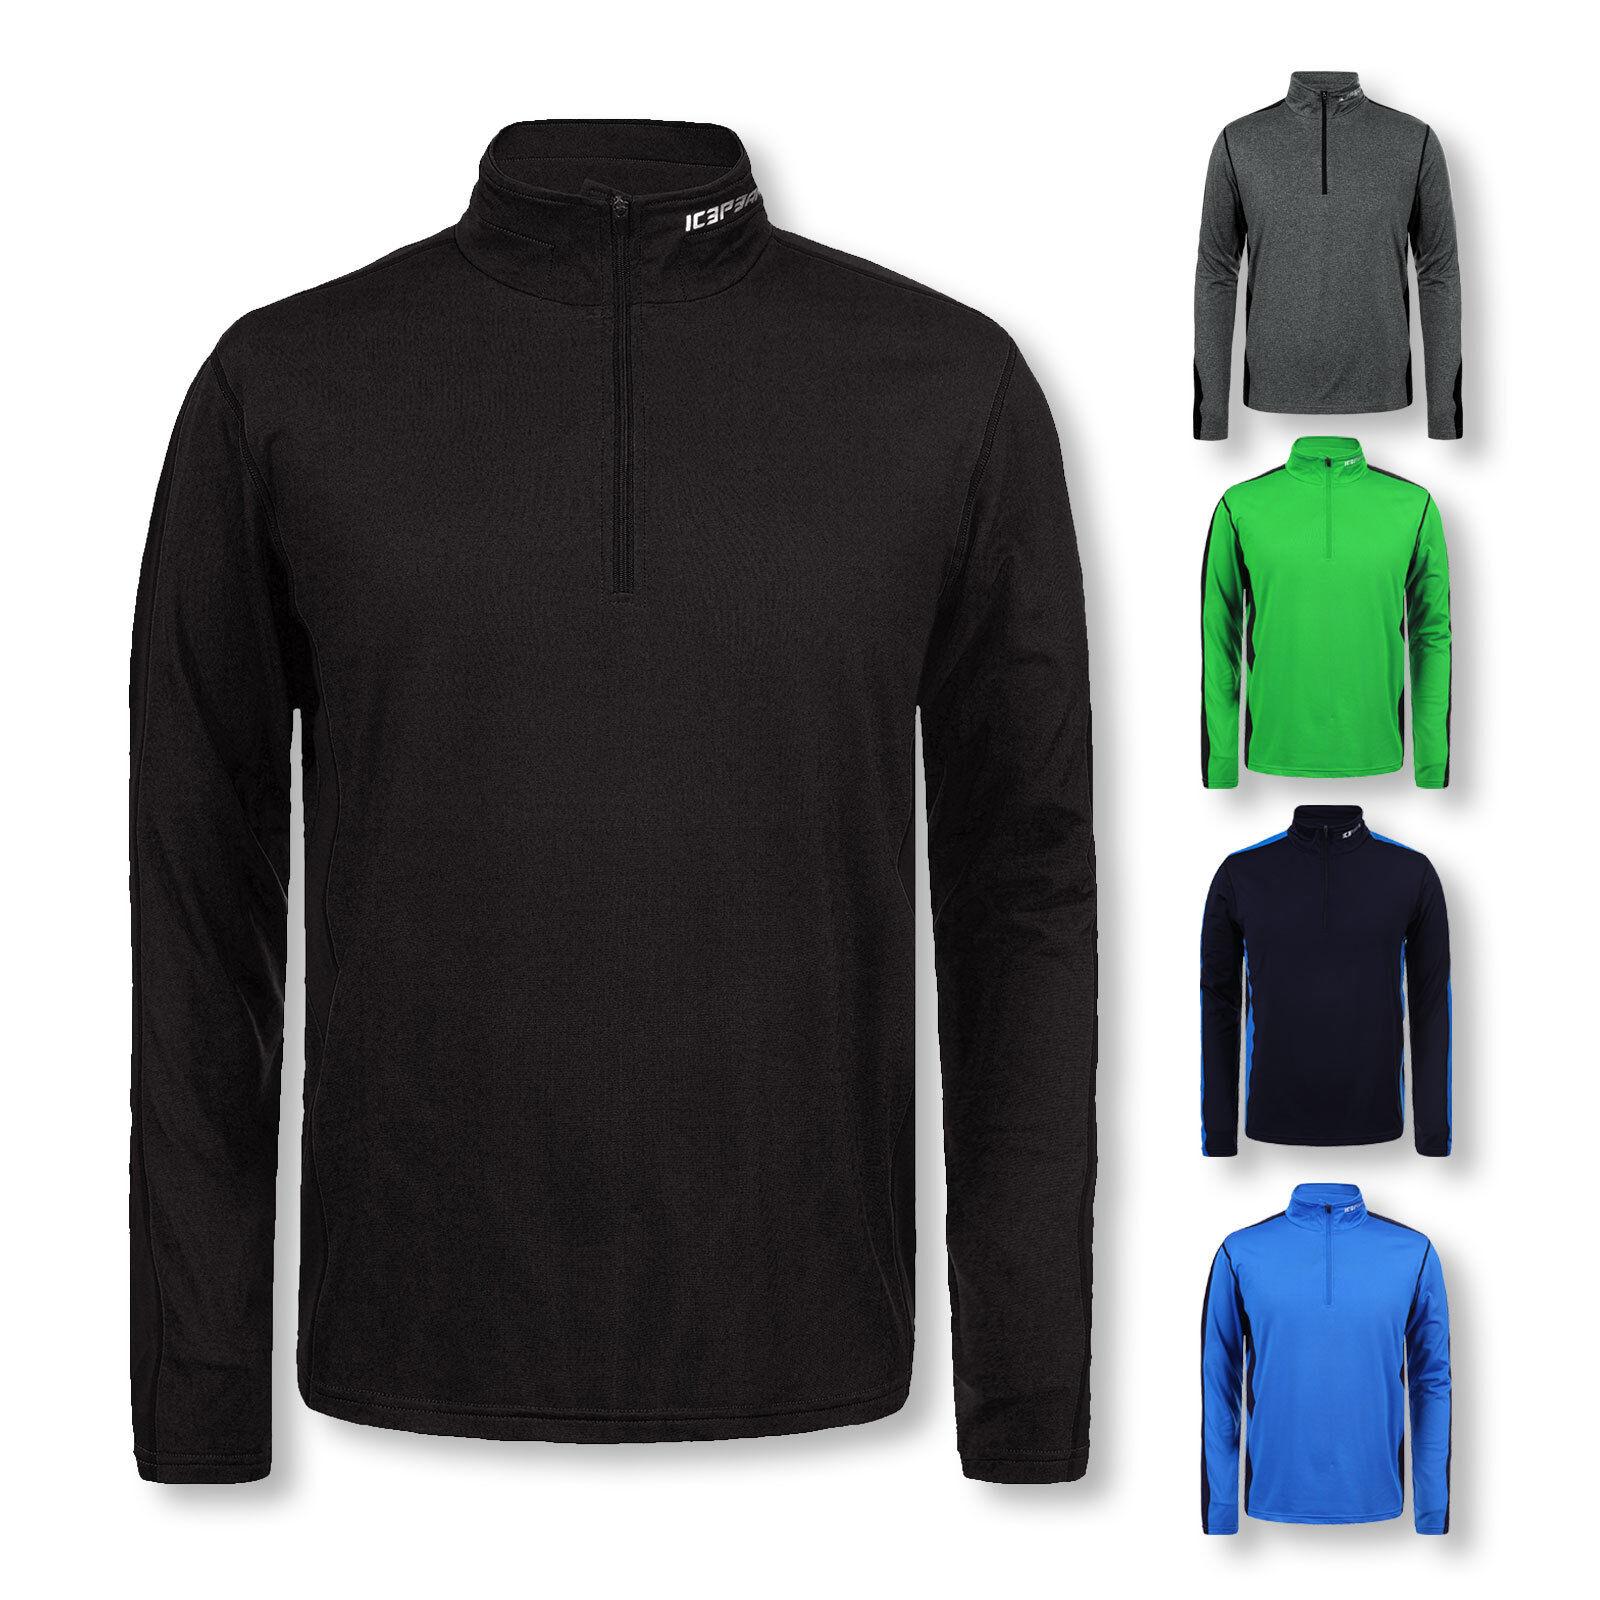 Icepeak Herren Skipullover Funktionsshirt Thermoshirt Half Zip Robin Farbwahl